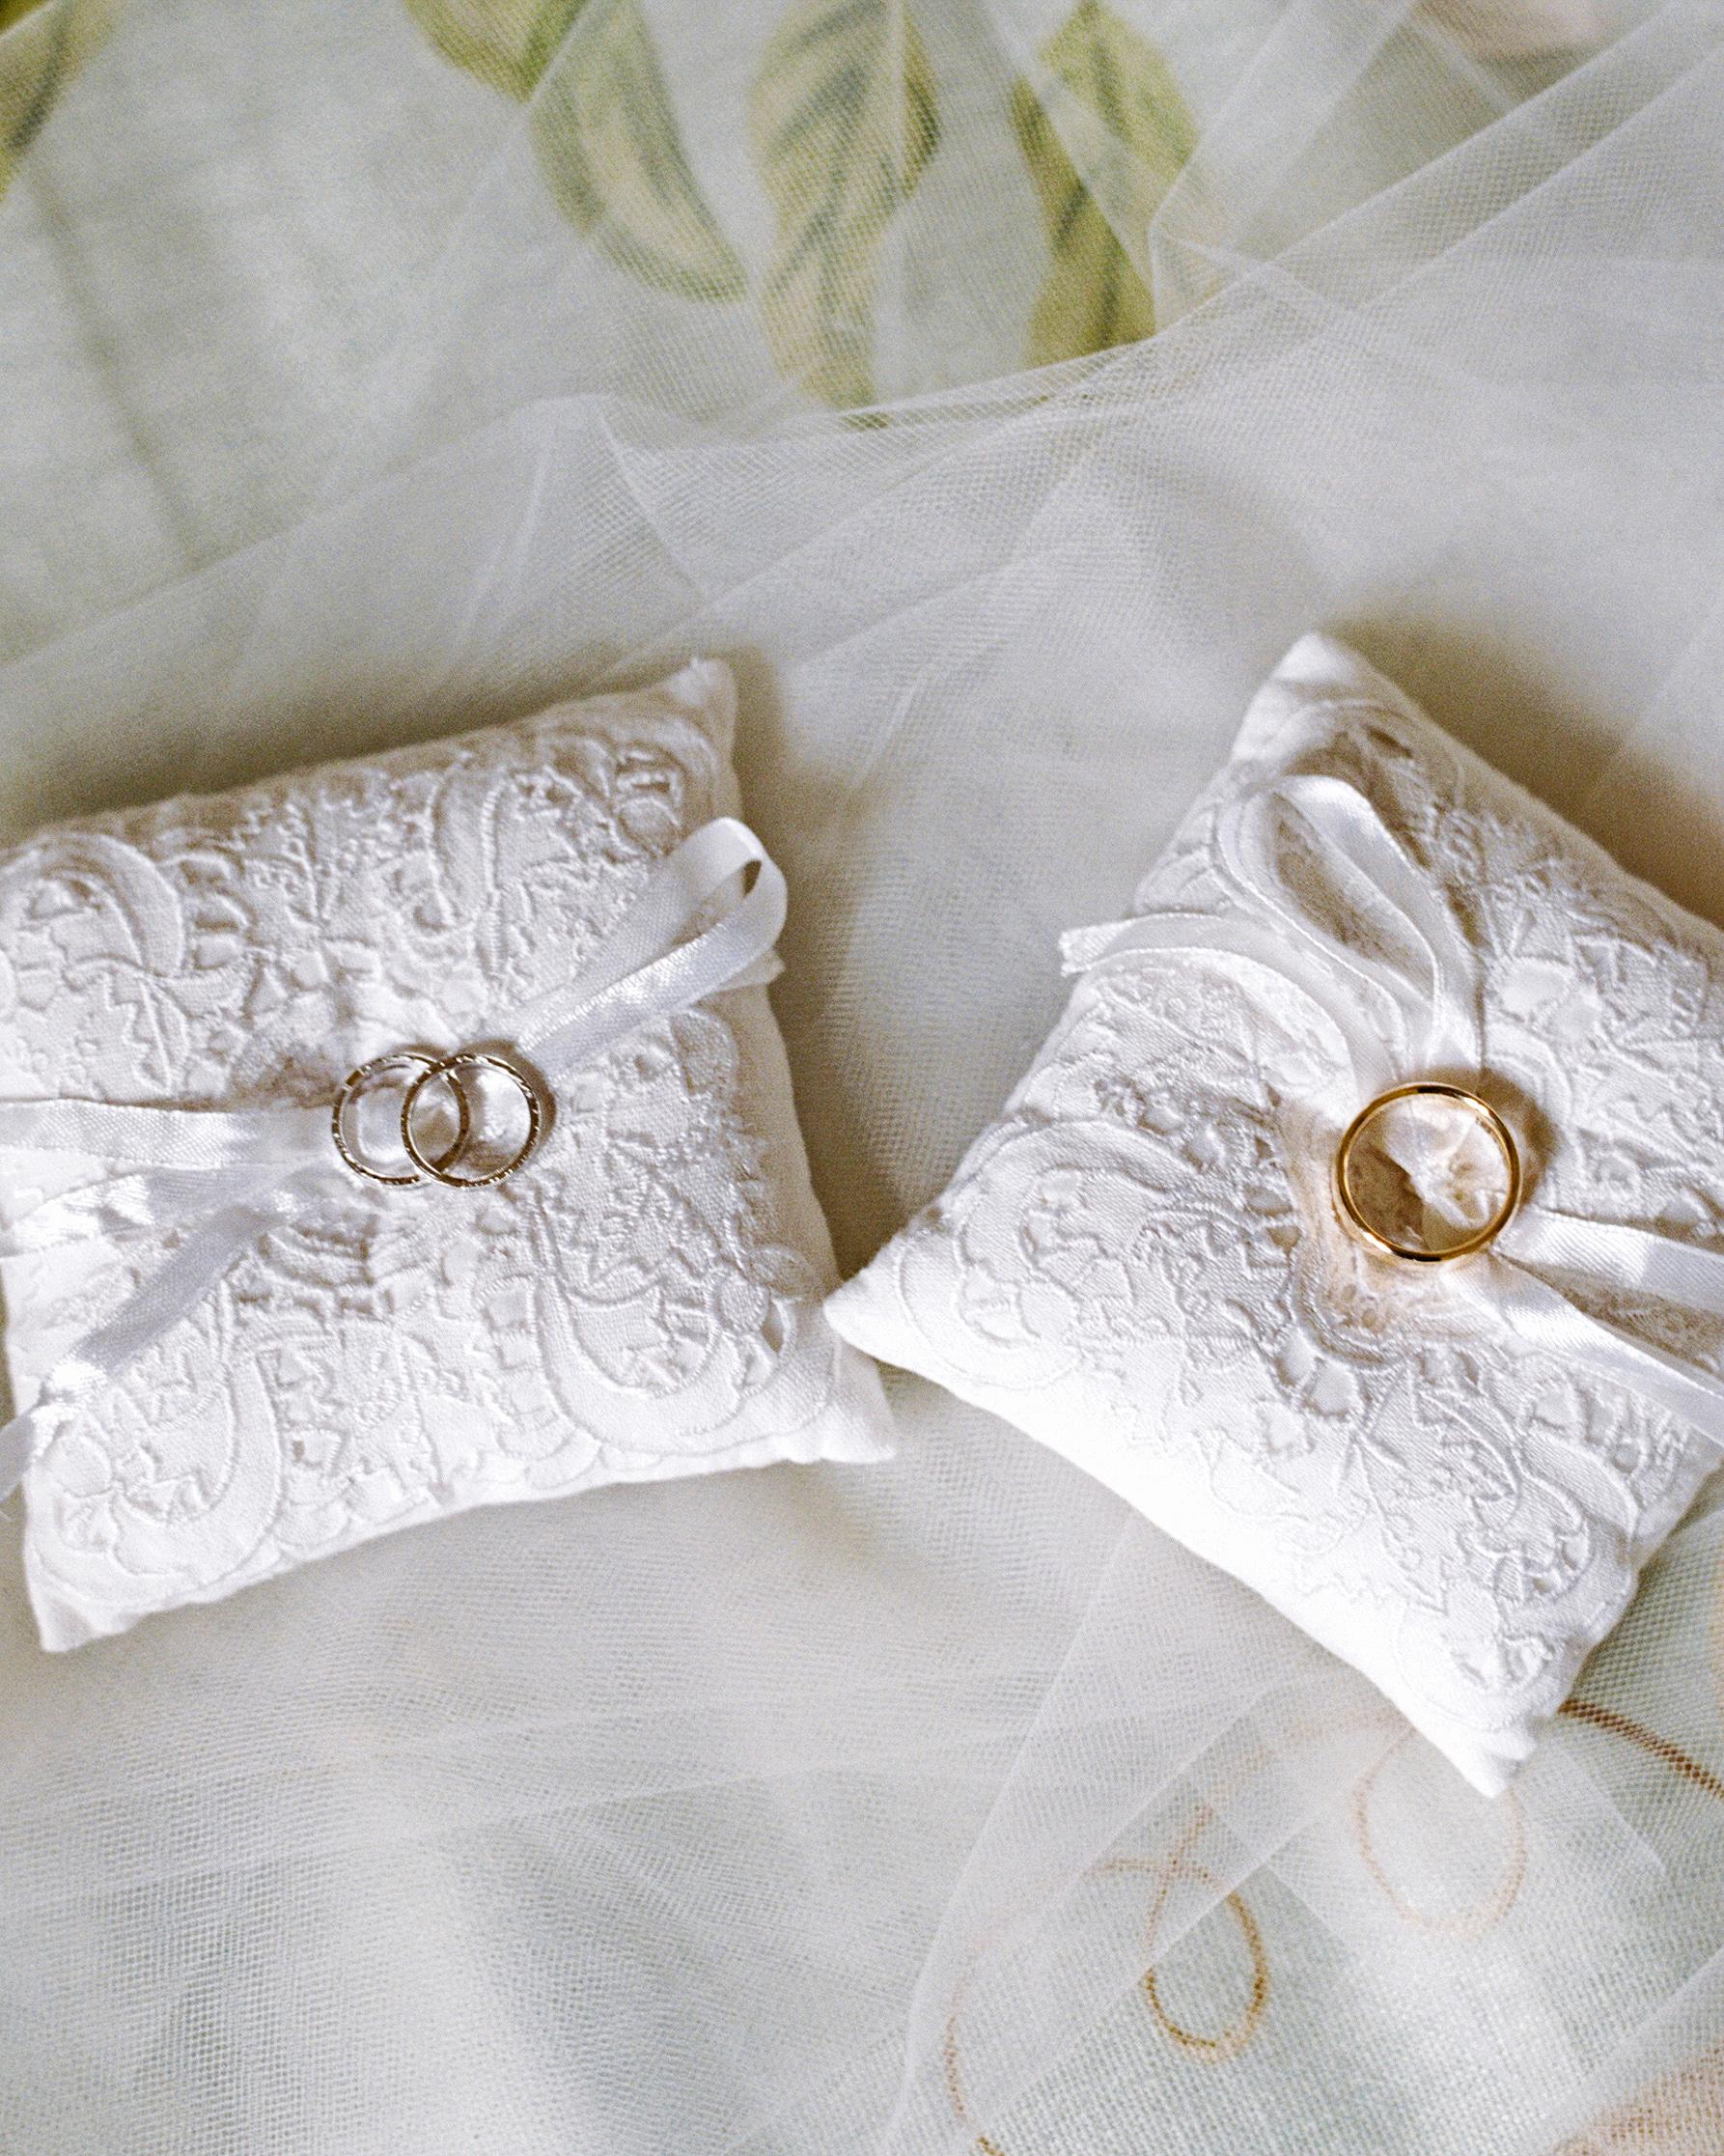 kate austin wedding rings pillows